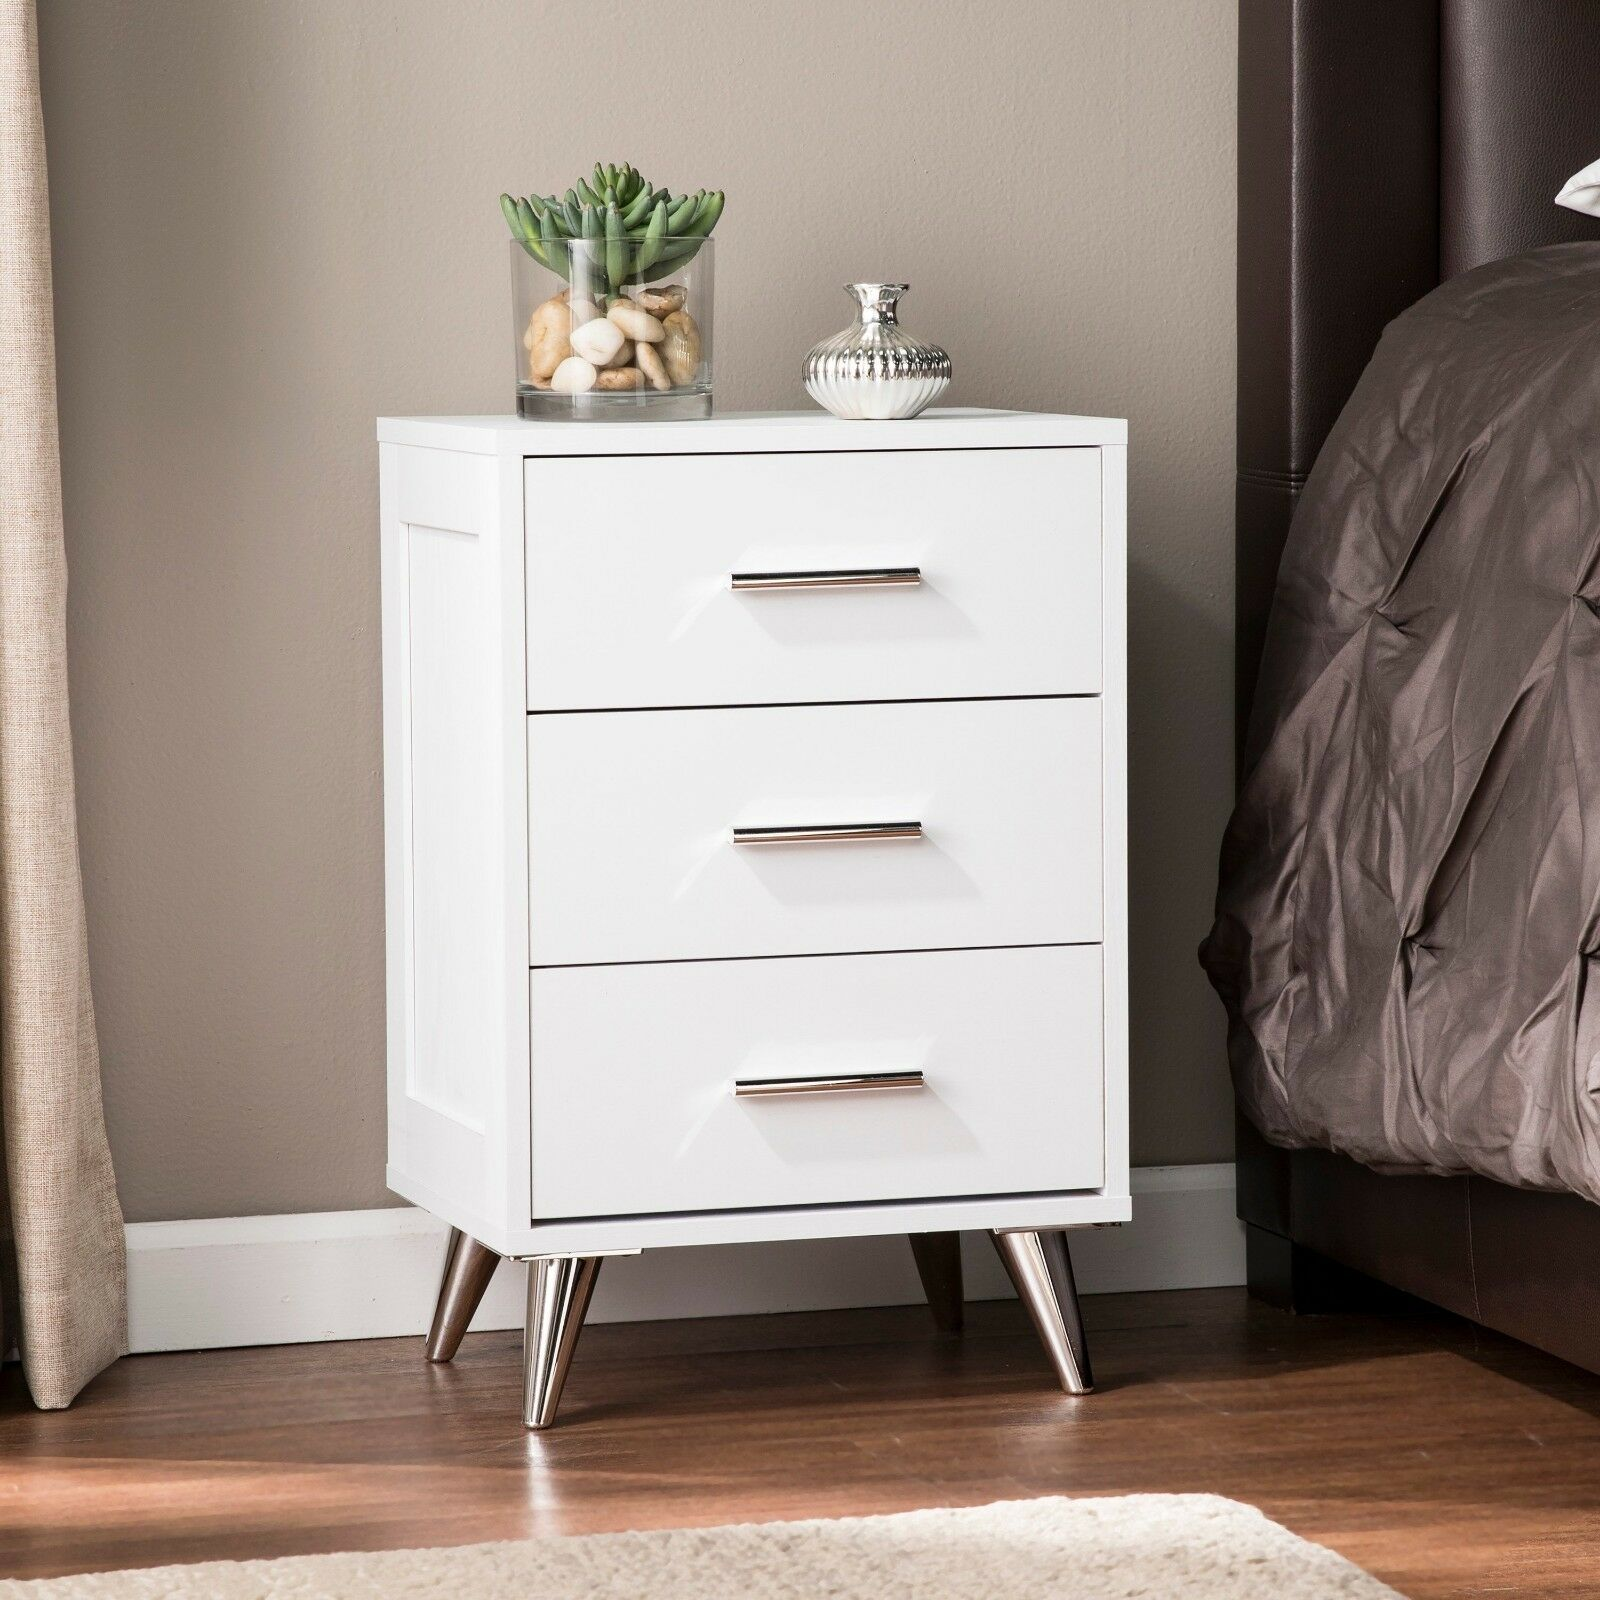 Mid Century Modern White Silver 3 Drawer Nightstand End Table Storage Chest